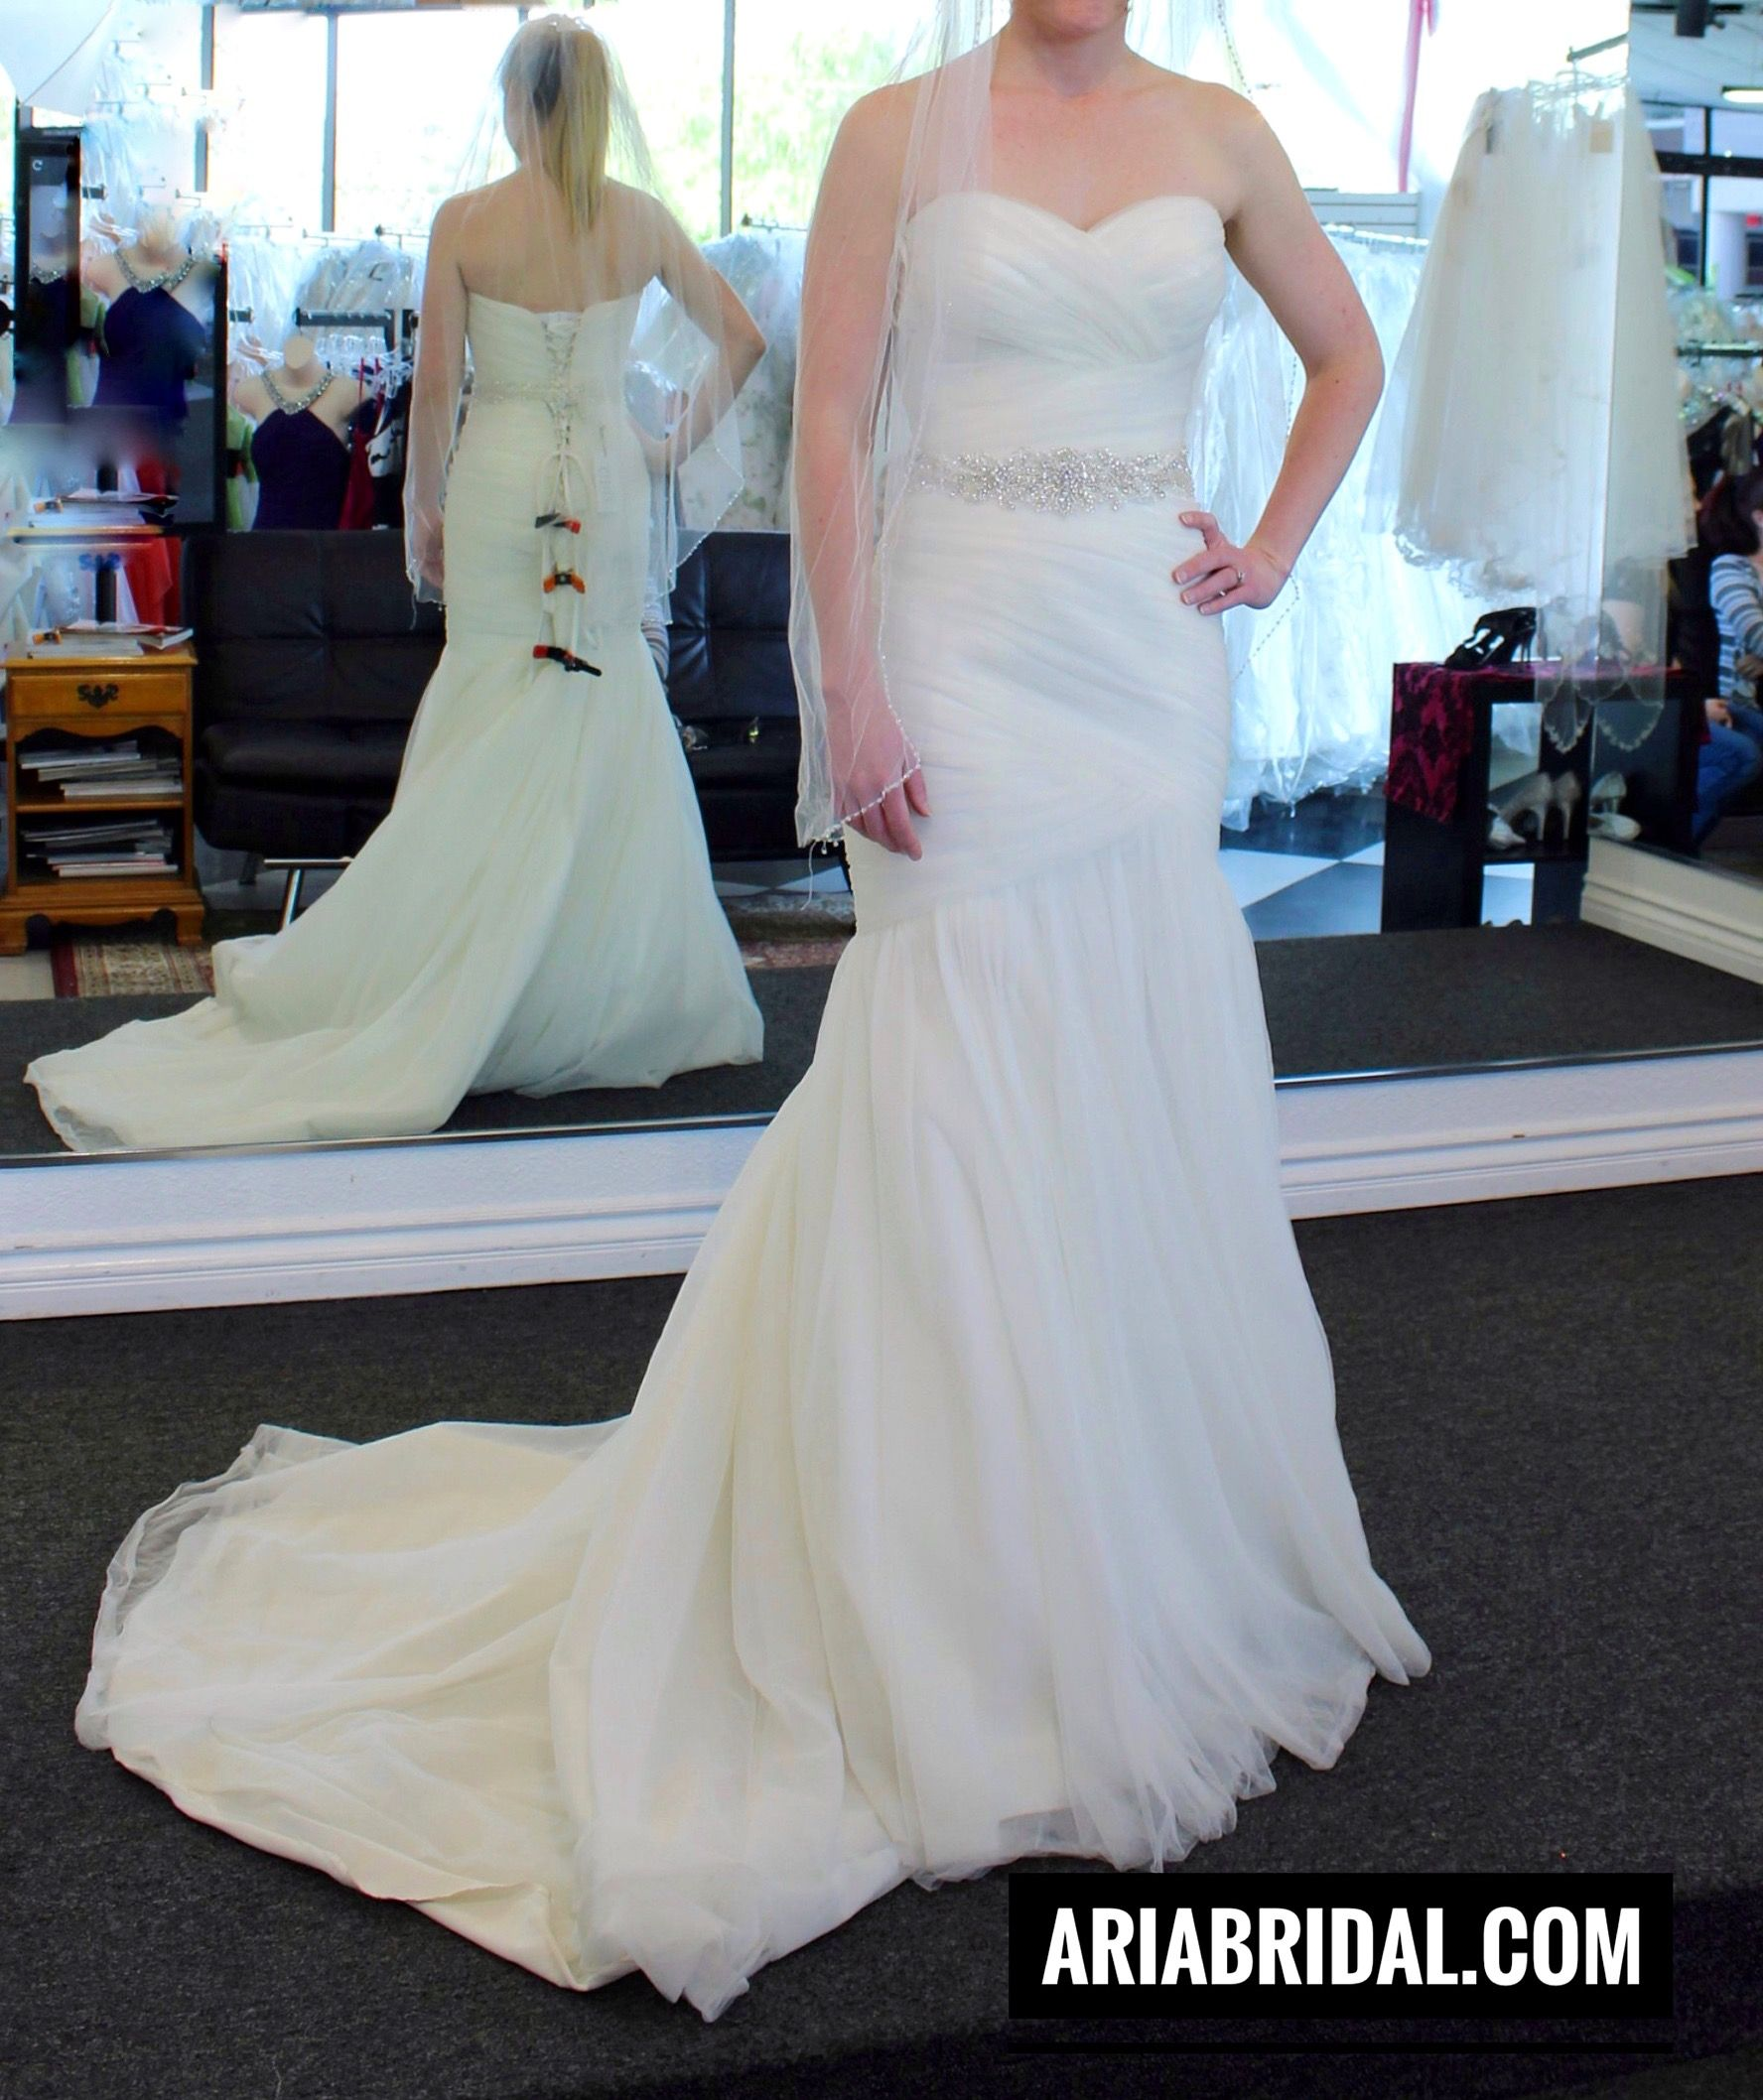 Wedding Dress at Aria Bridal in Escondido, California. Beautiful ...